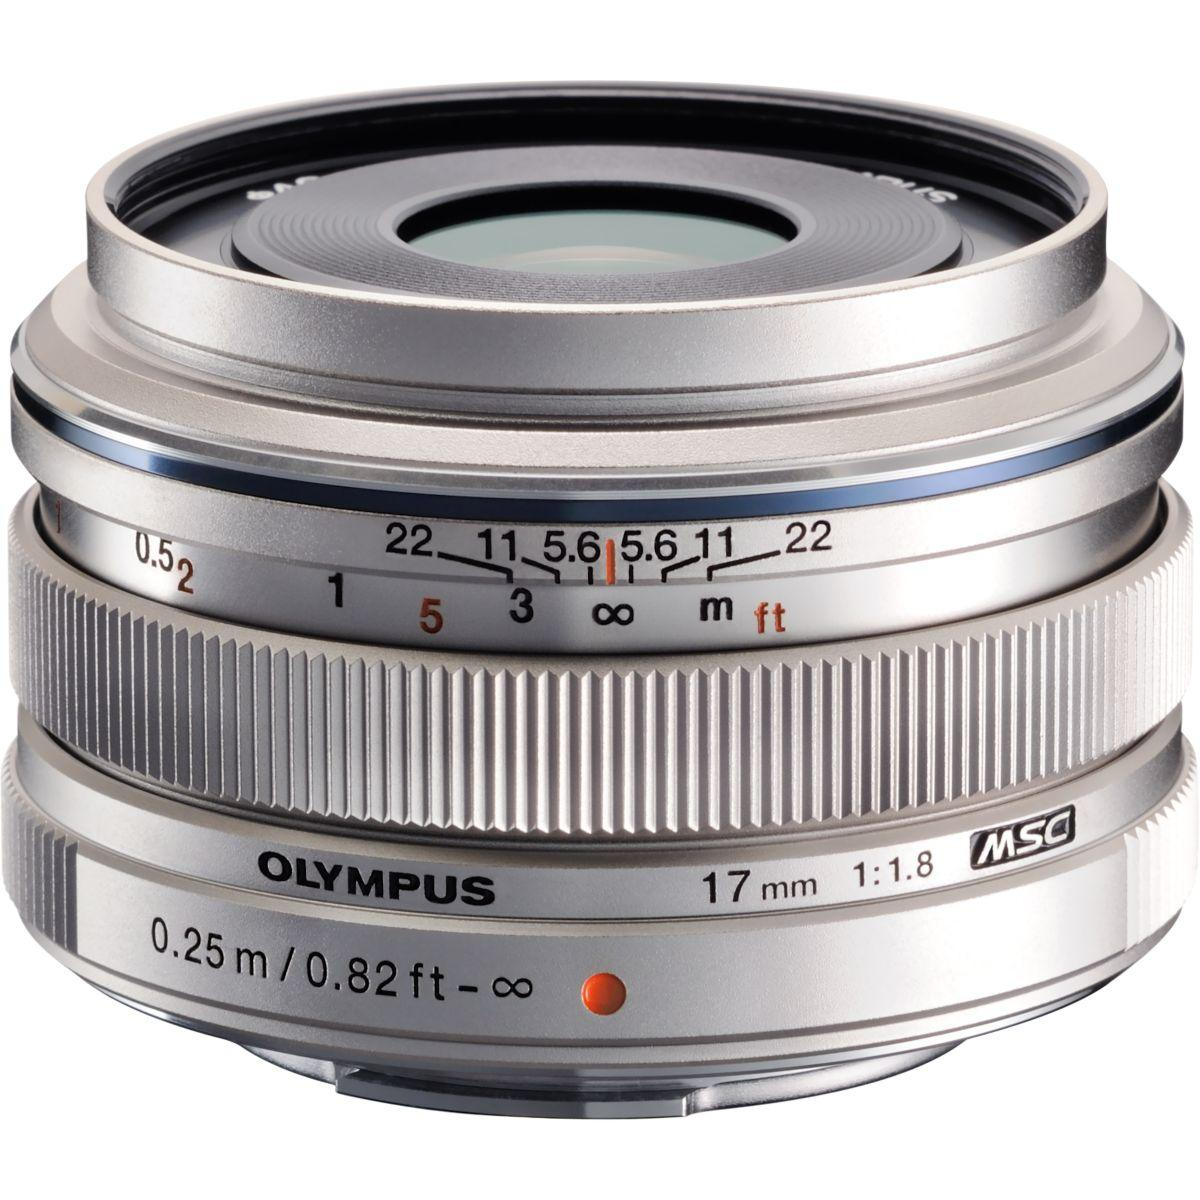 Objectif pour hybride olympus 17mm f/1.8 silver m.zuiko